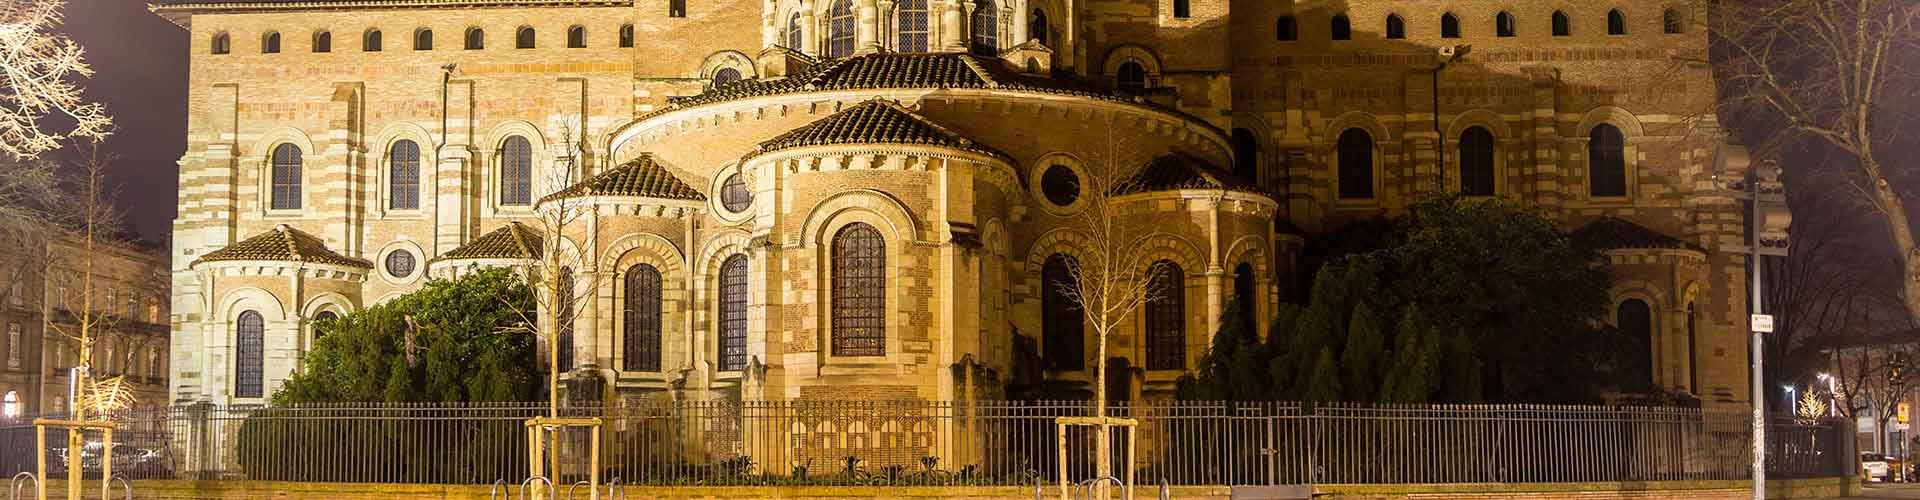 Toulouse - Hostales en el distrito Saint-Sernin. Mapas de Toulouse, Fotos y comentarios de cada Hostal en Toulouse.